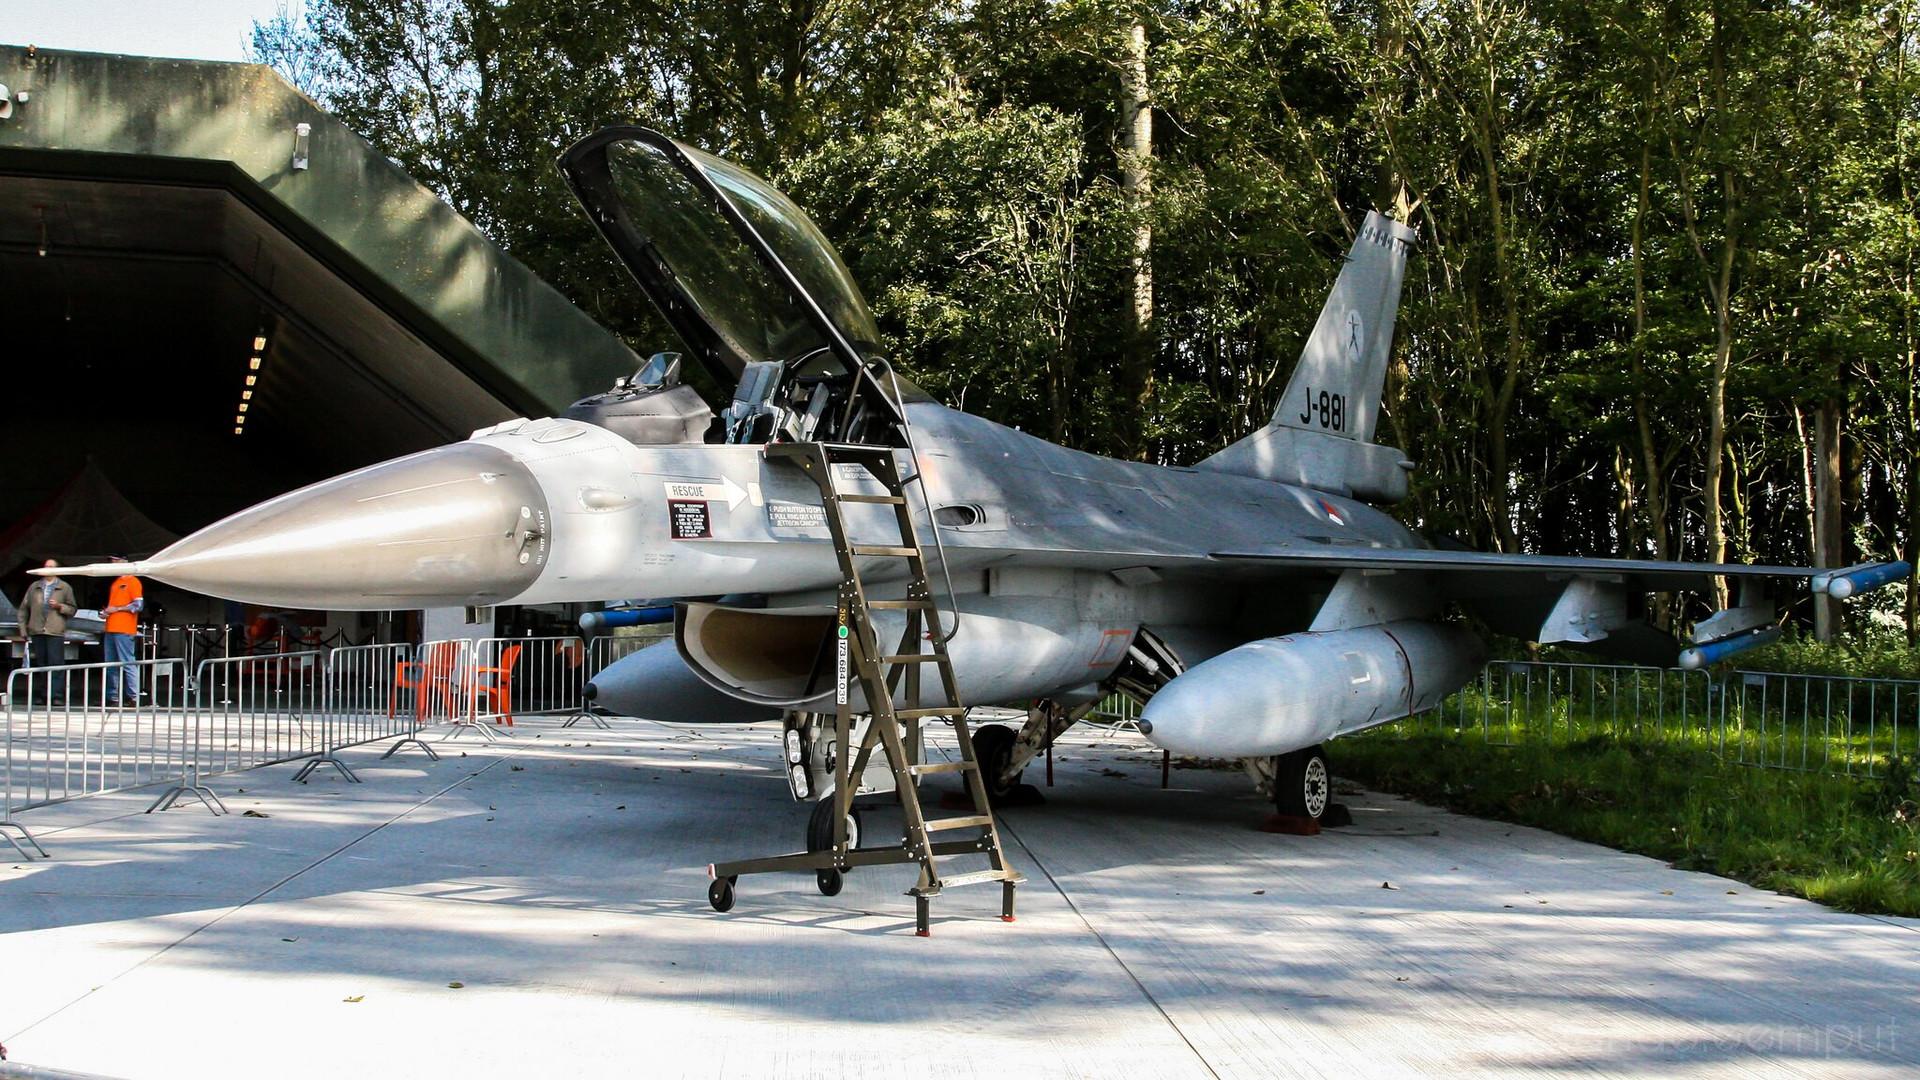 J-881   Build: 1985 - Lockheed Martin F-16 A Fighting Falcon